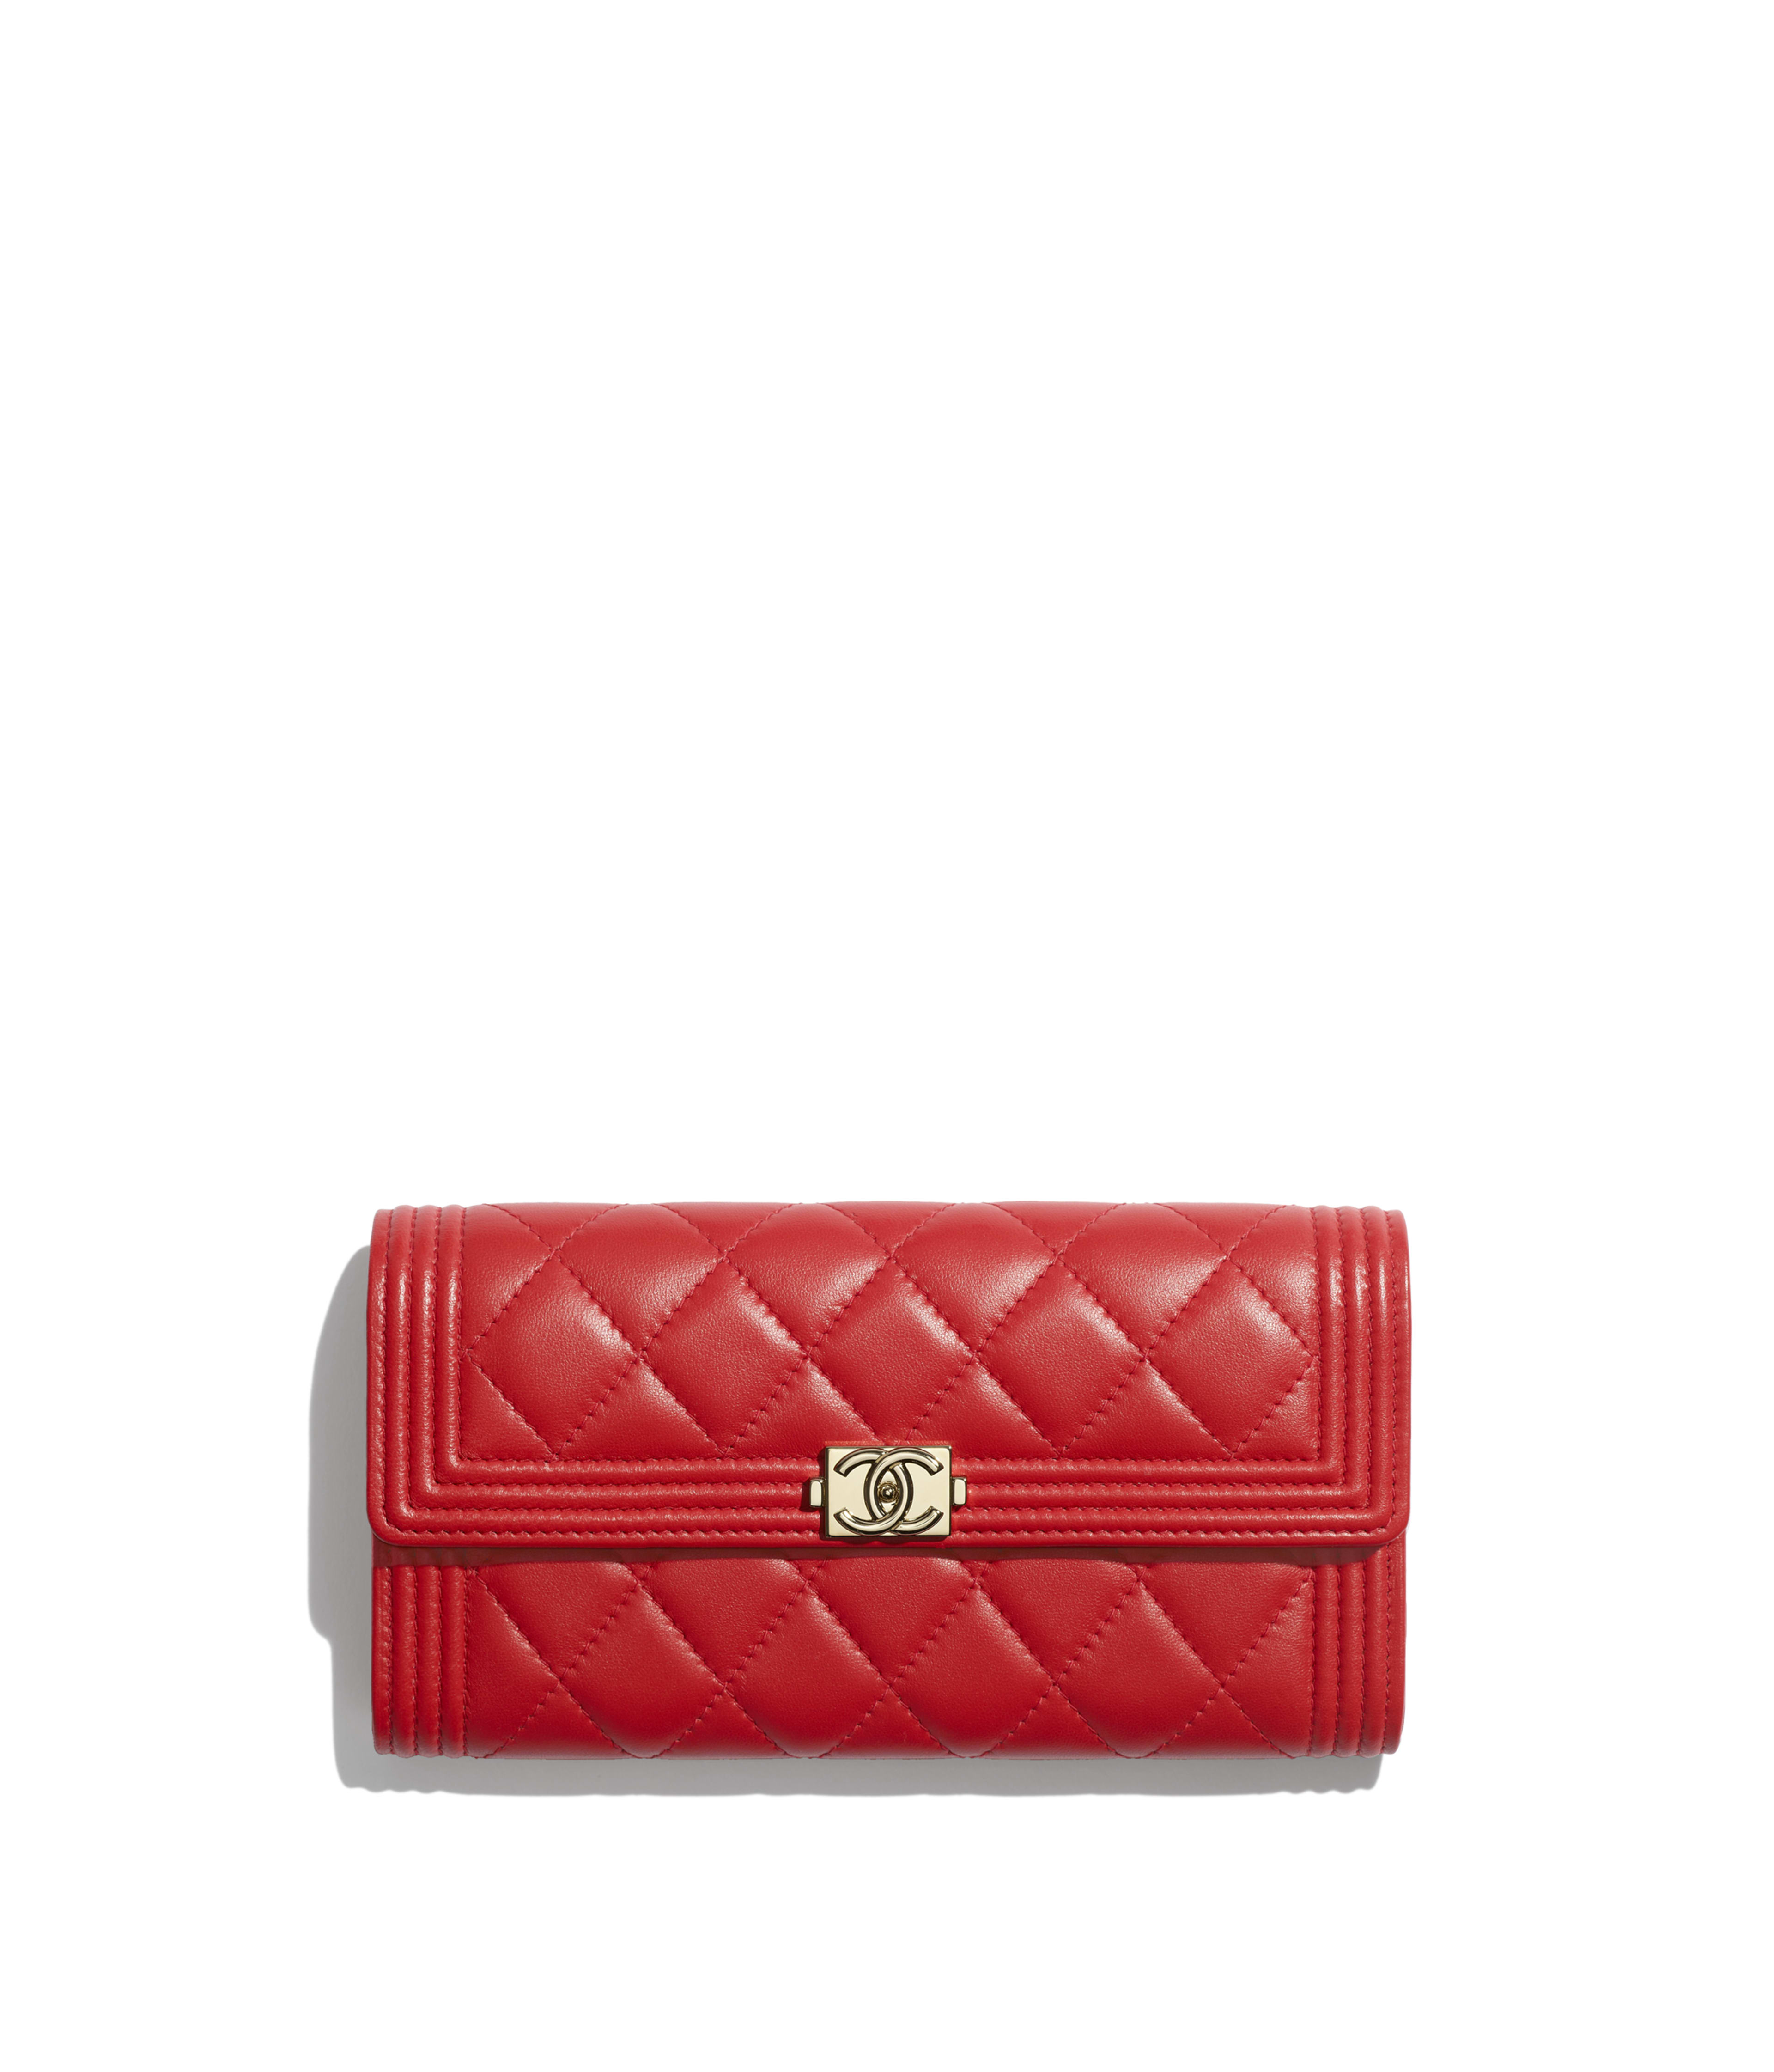 b200601b468c93 BOY CHANEL Long Flap Wallet Lambskin & Gold-Tone Metal, Red Ref.  A80286Y04059N0413